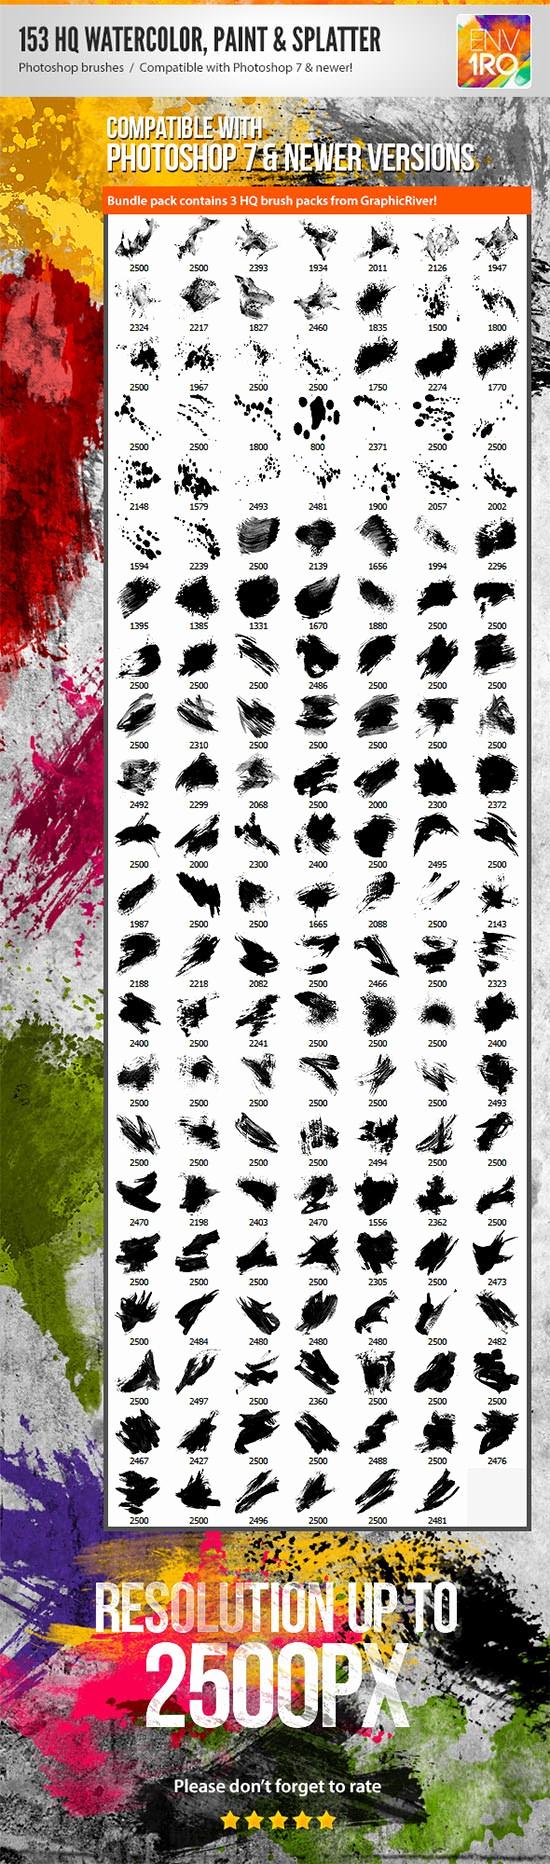 Paint Splatter Brush Photoshop Best Of 110 Best Downloadable Shop Paint Splatter Brushes